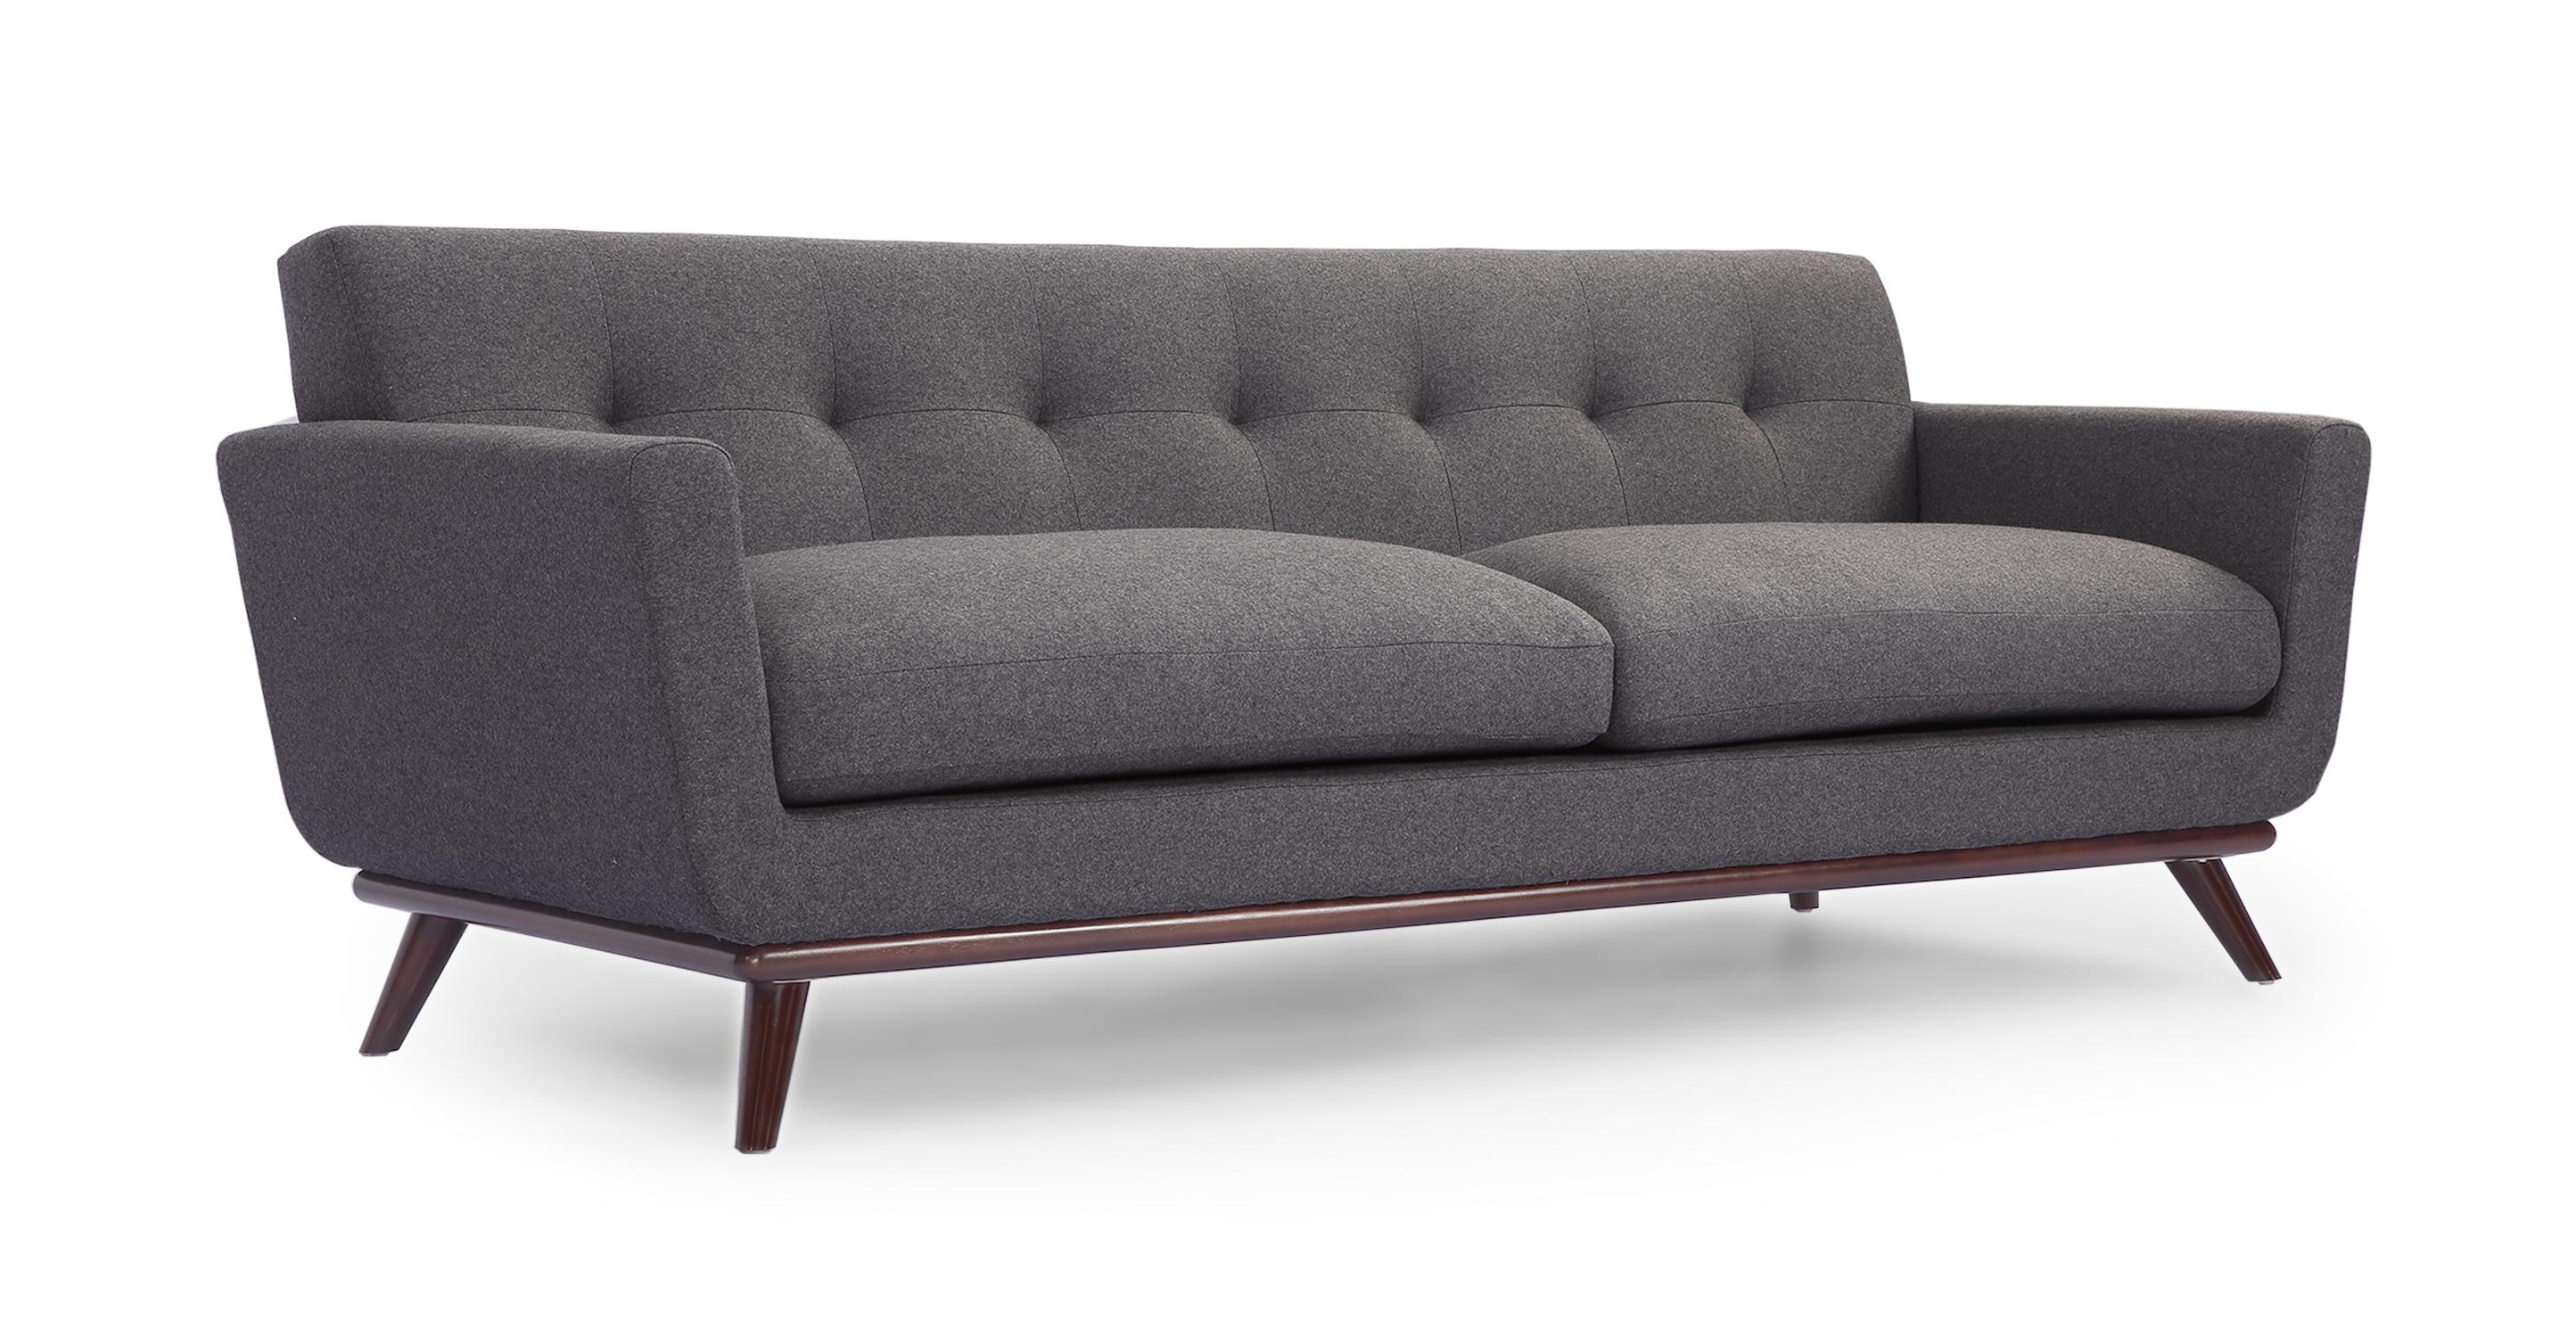 Jackie mid century modern classic sofa cadet grey for Classic sofa